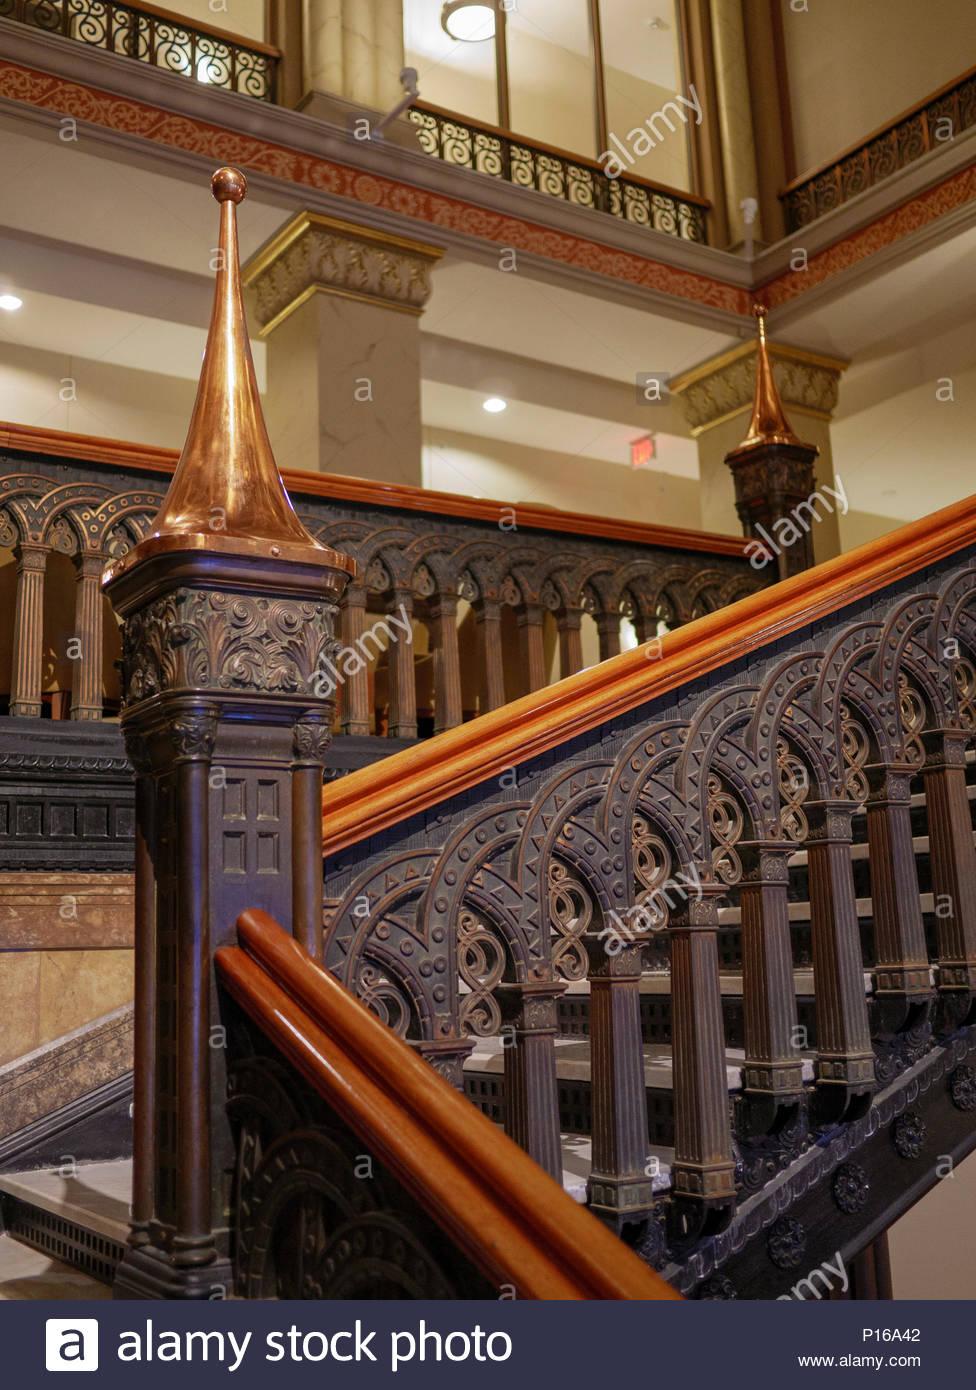 Hilton Garden Inn Stock Photos & Hilton Garden Inn Stock Images - Alamy